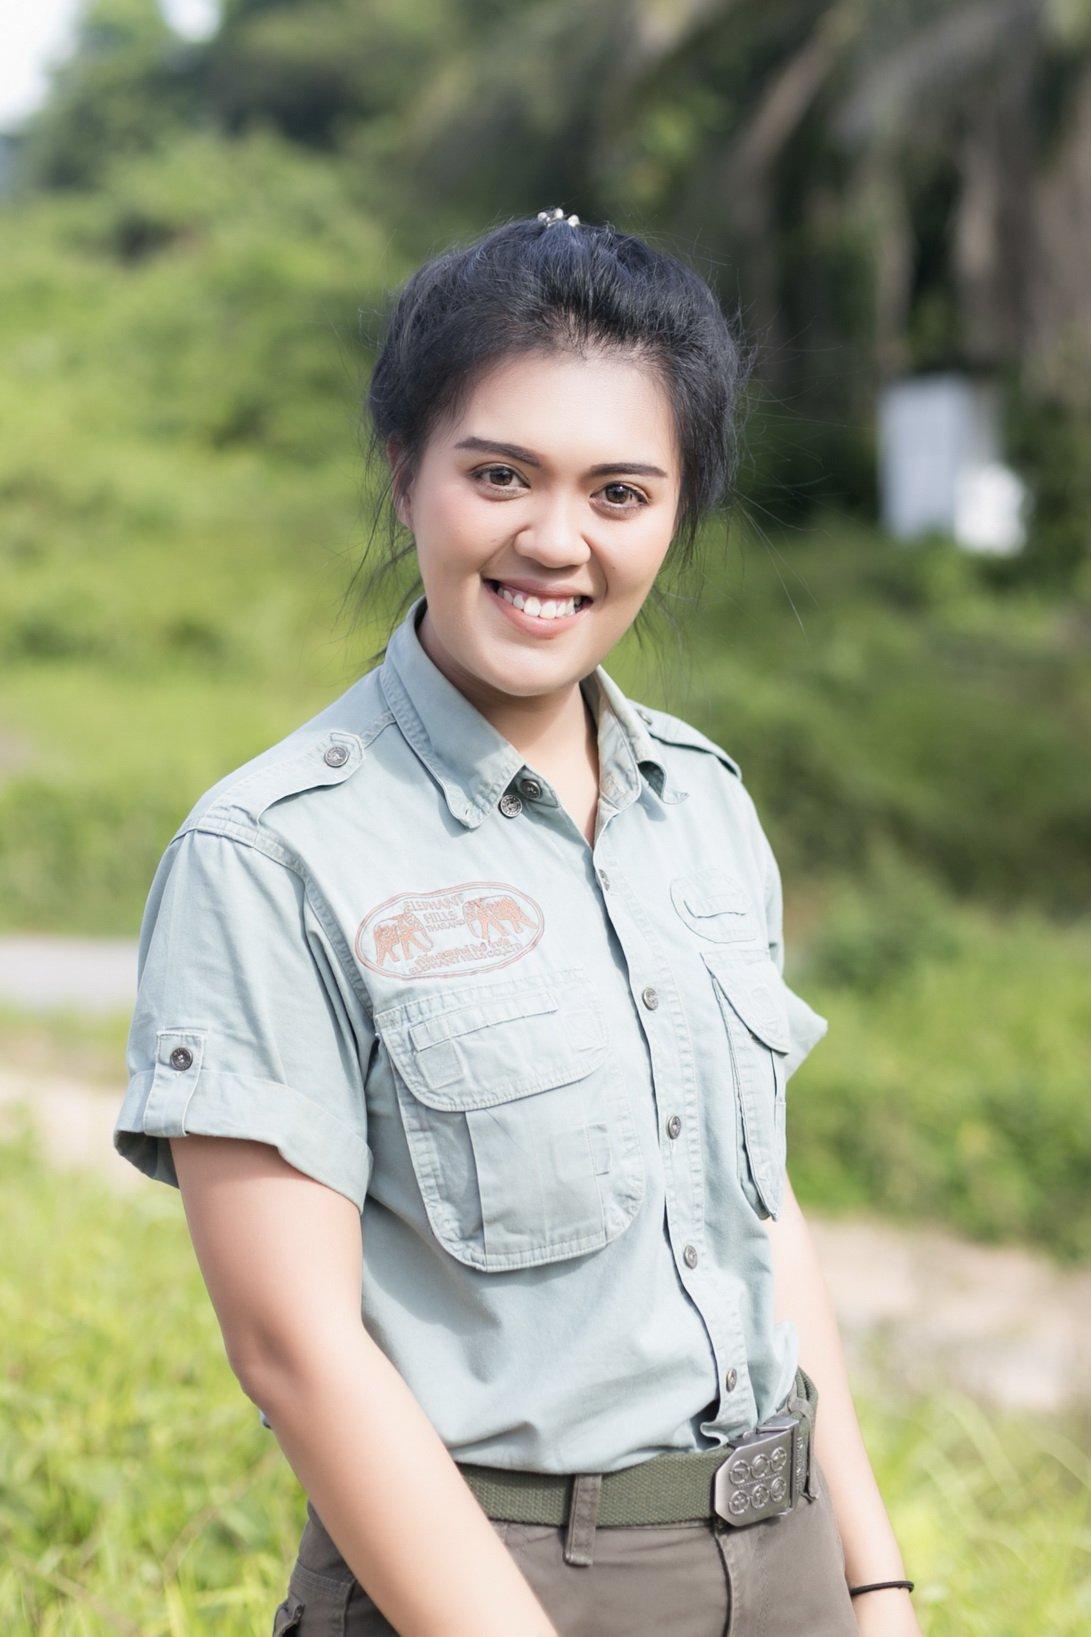 Pang Pond